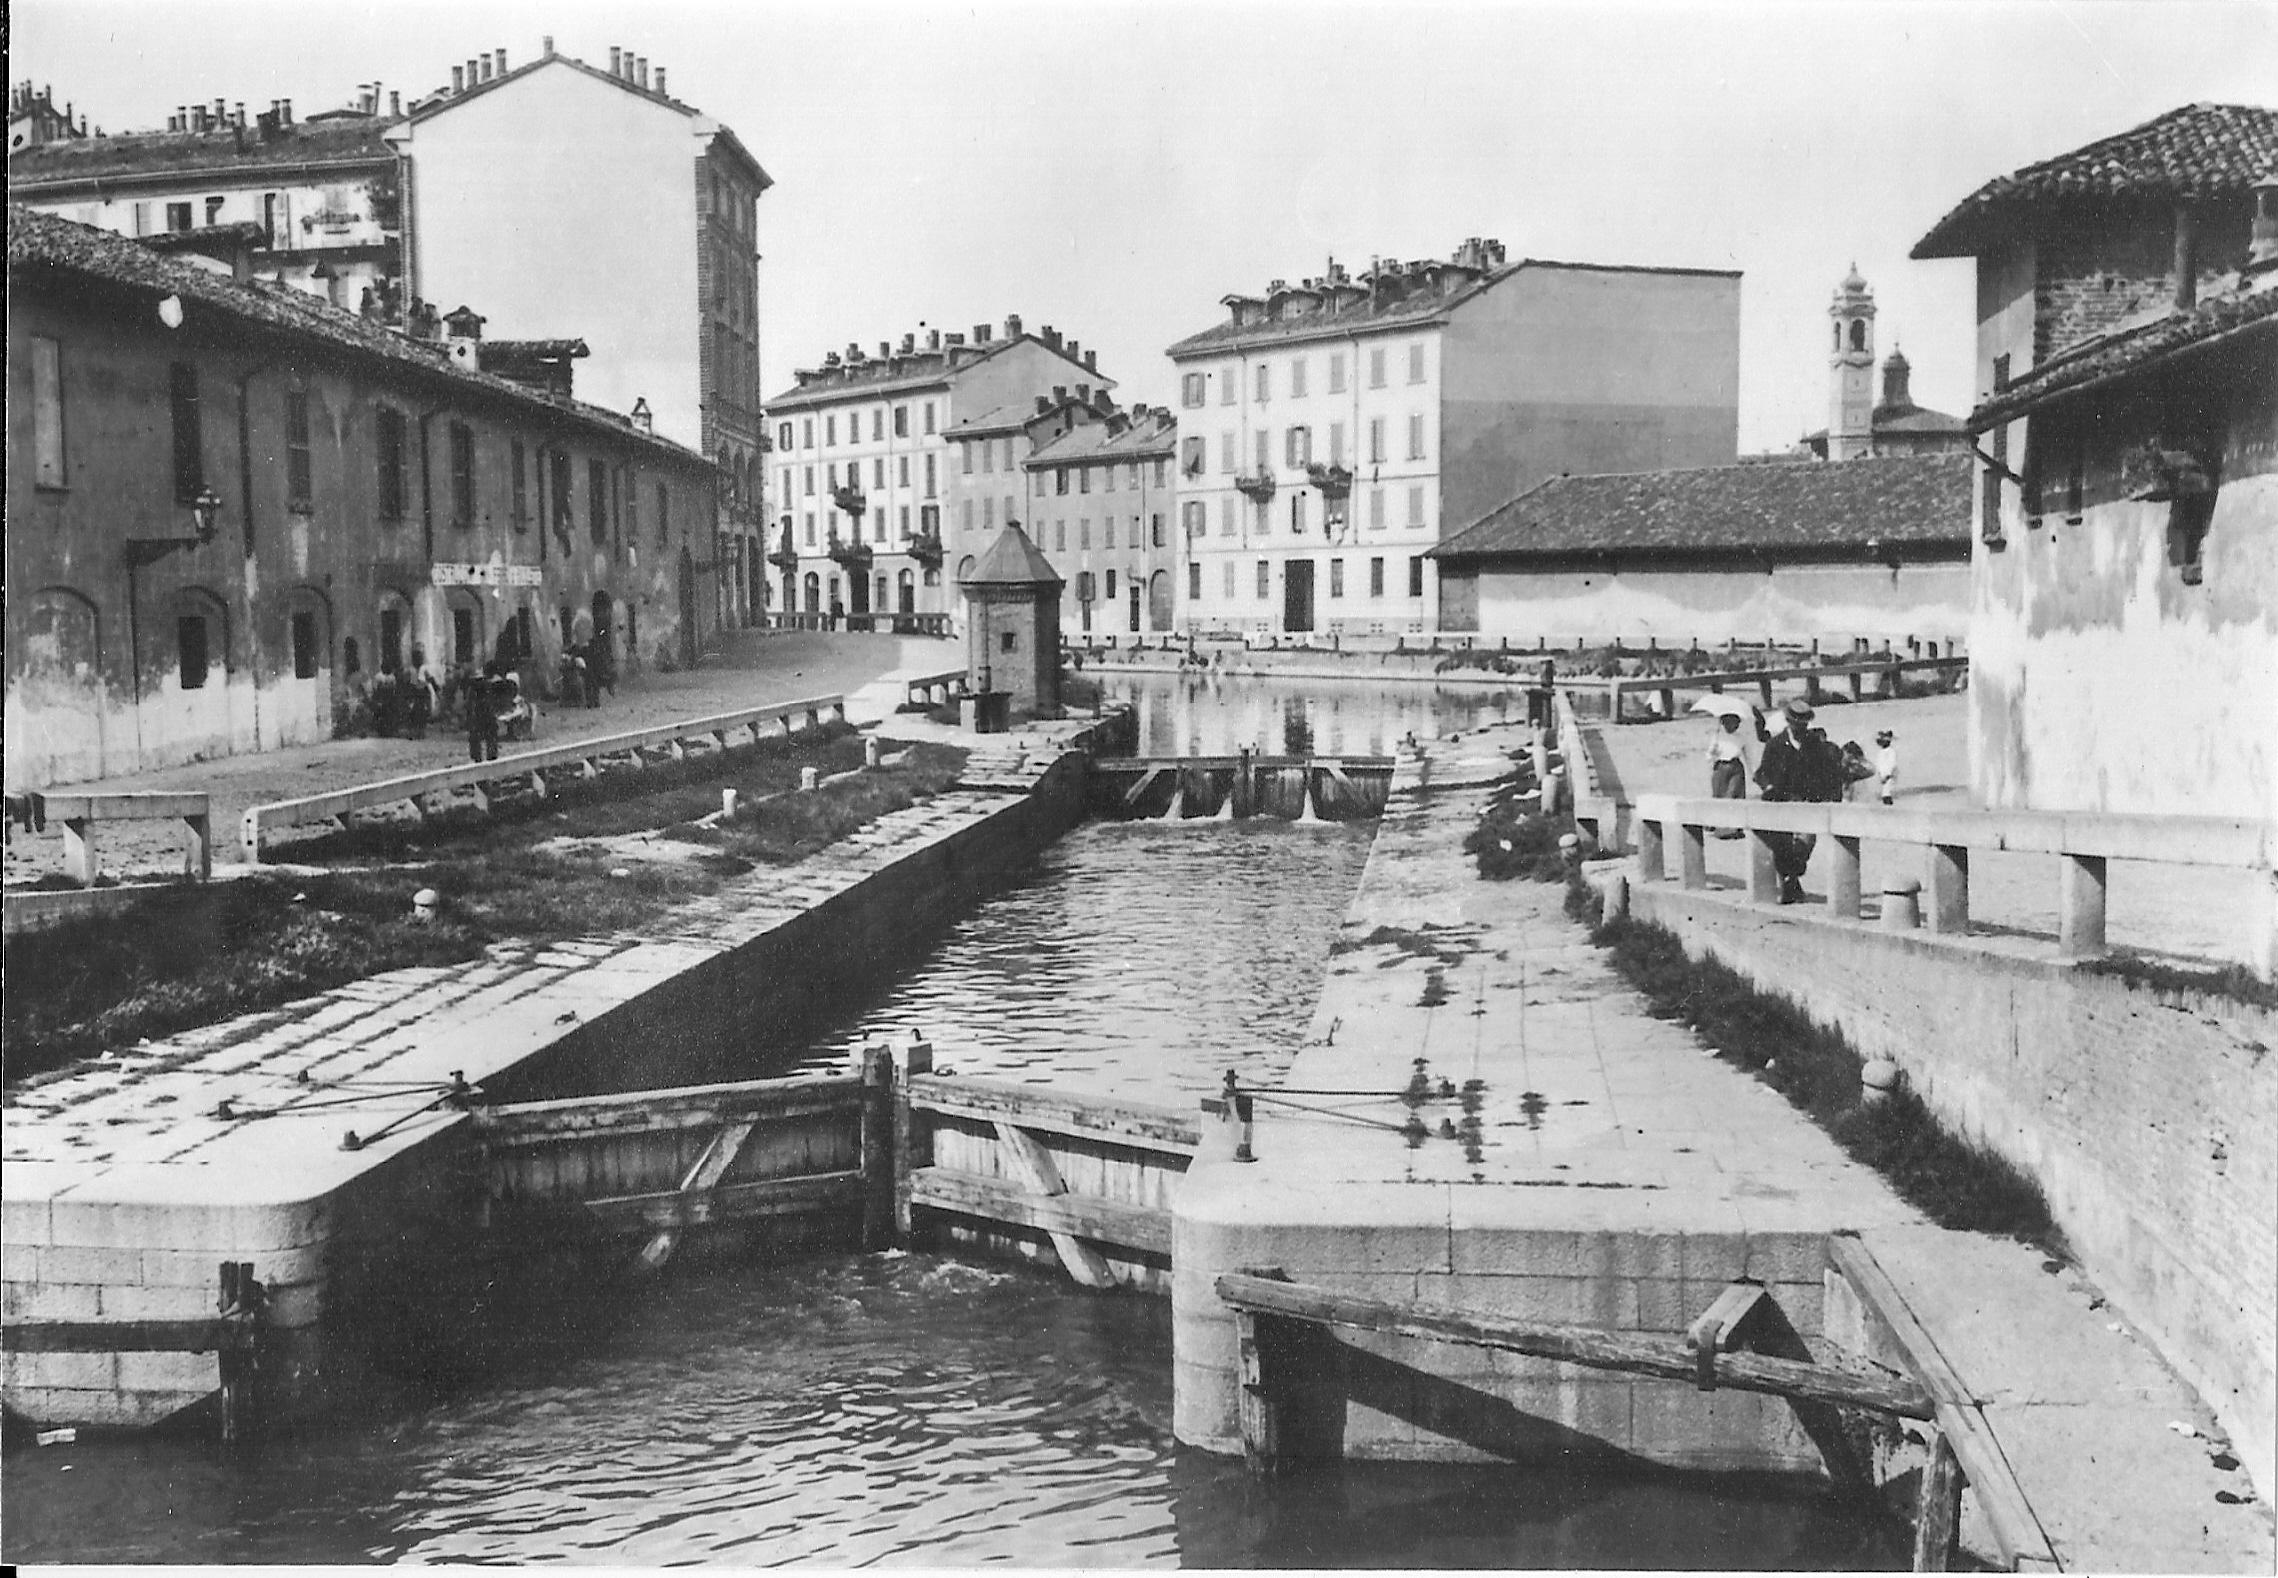 Monza Via Delle Industrie Ville Nuove